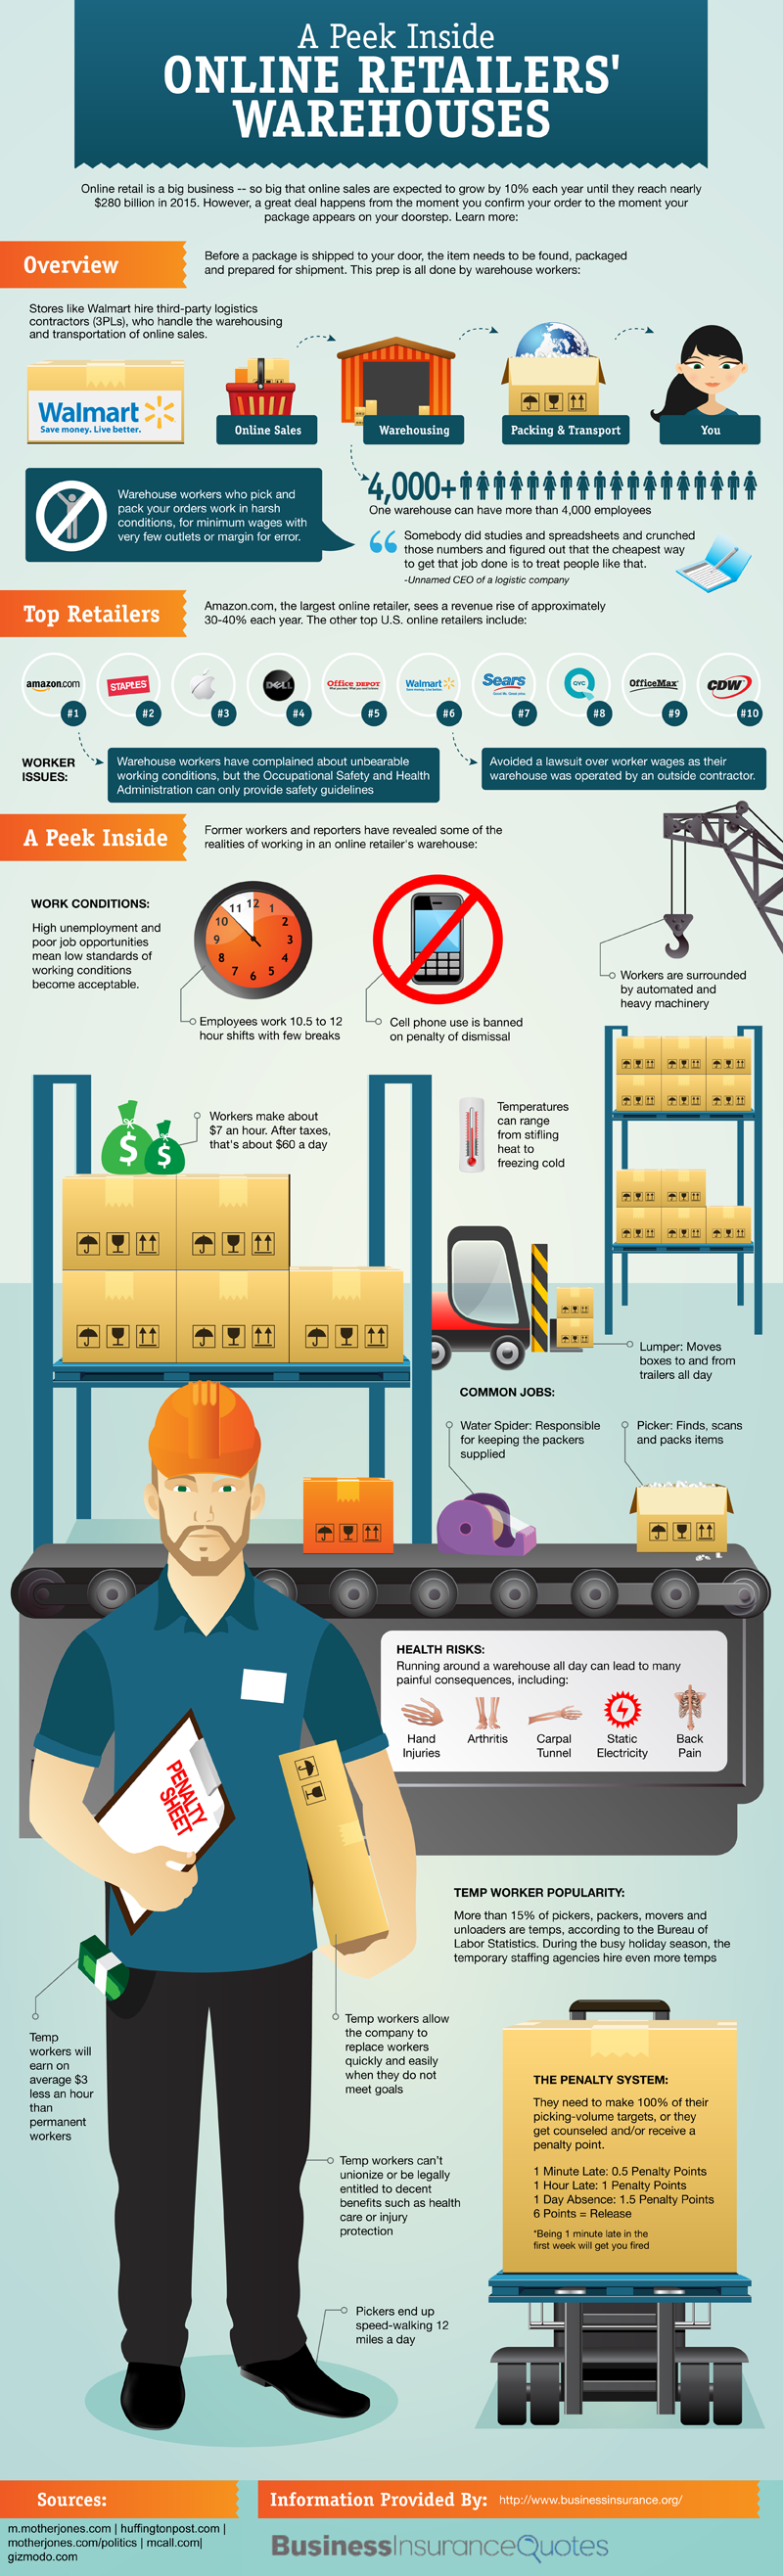 A Peek Inside Online Retailers' Warehouses